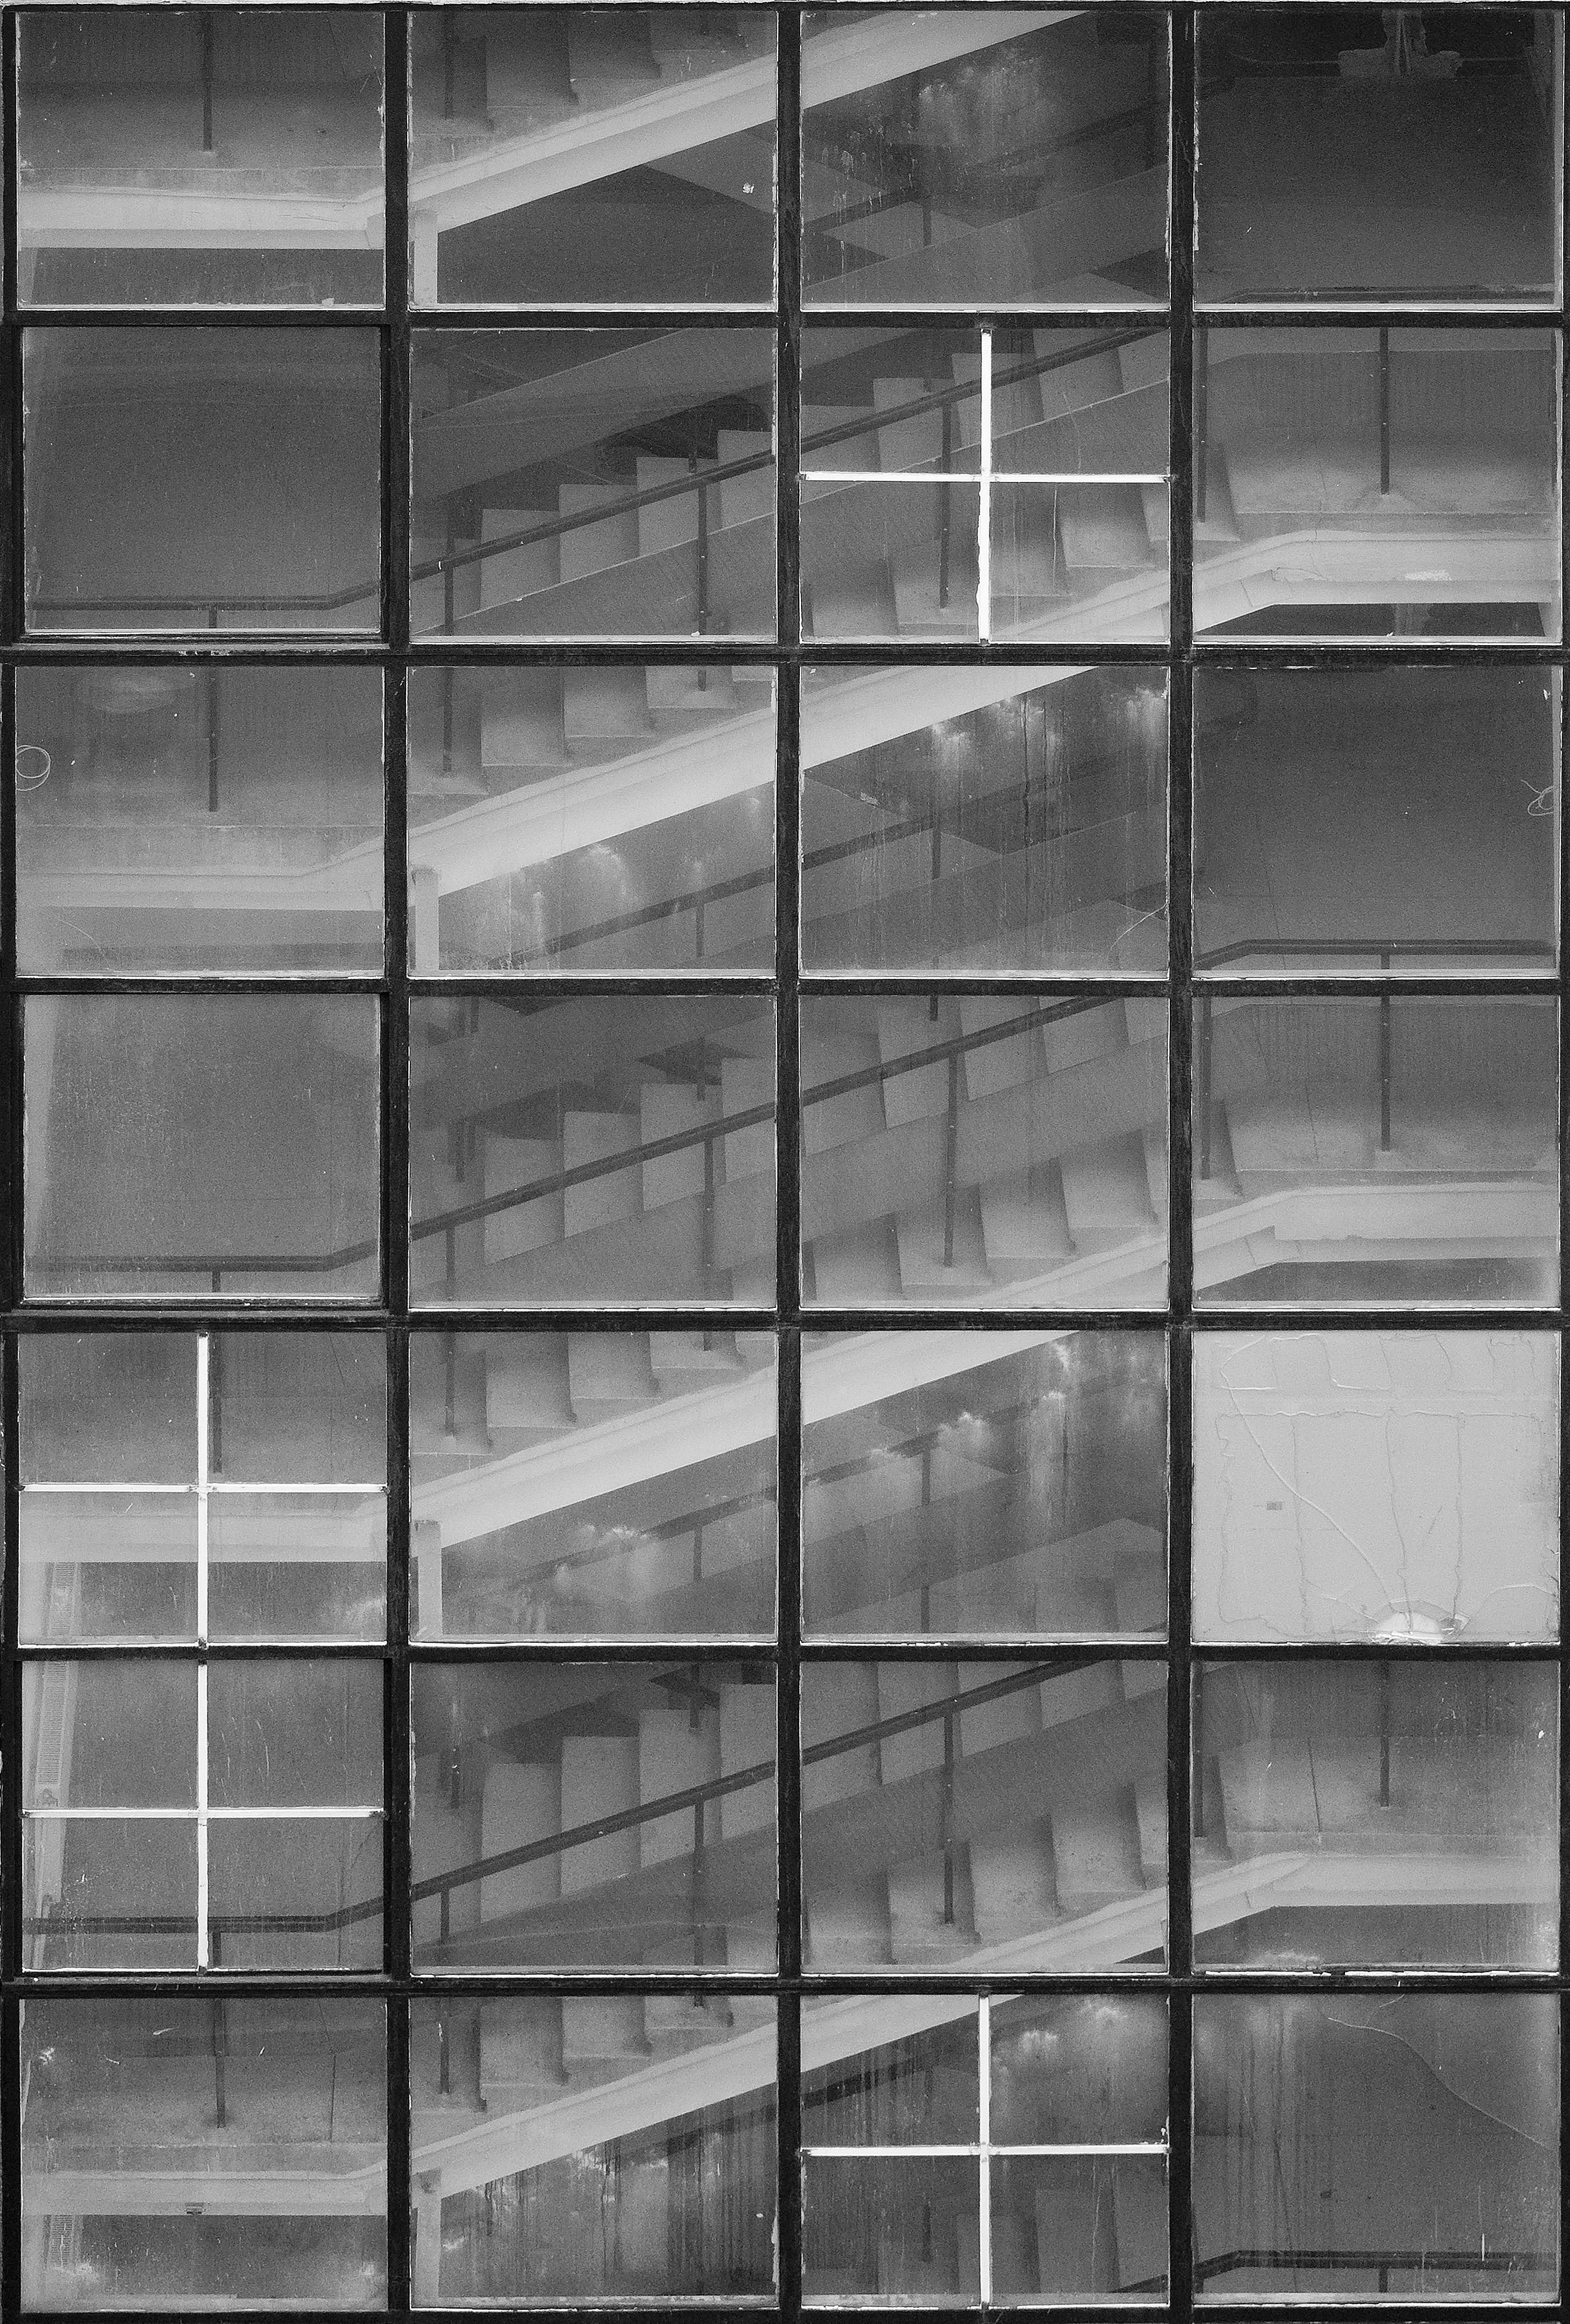 fot. Ewa Tulińska, kat. Forma Modernizmu